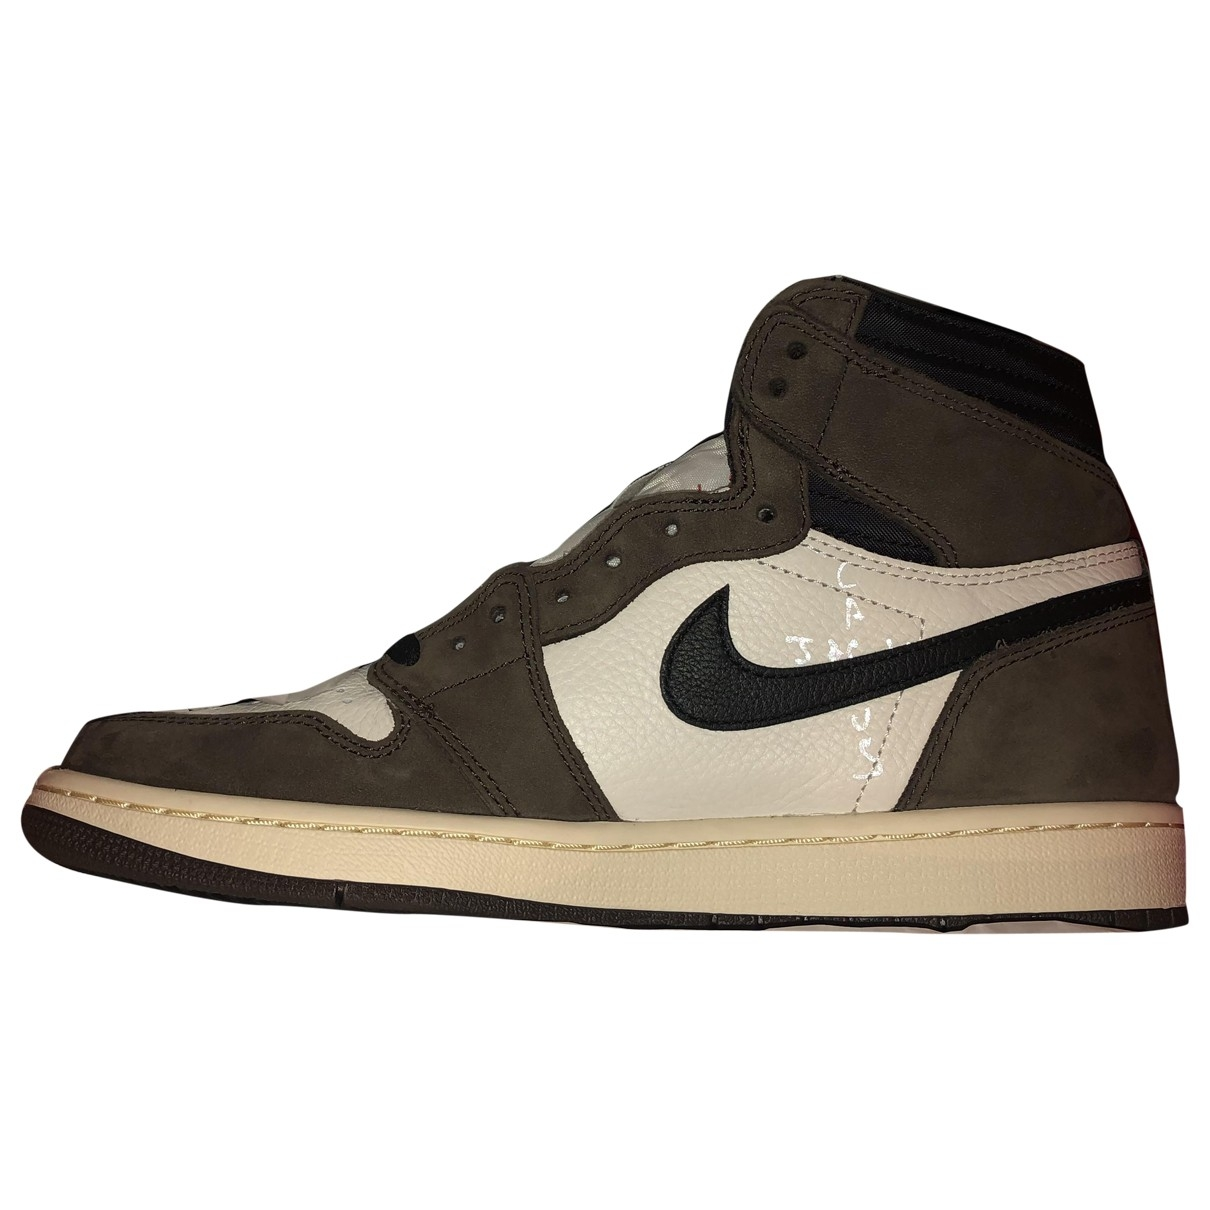 Nike X Travis Scott Air Jordan 1 Sneakers in  Braun Leder